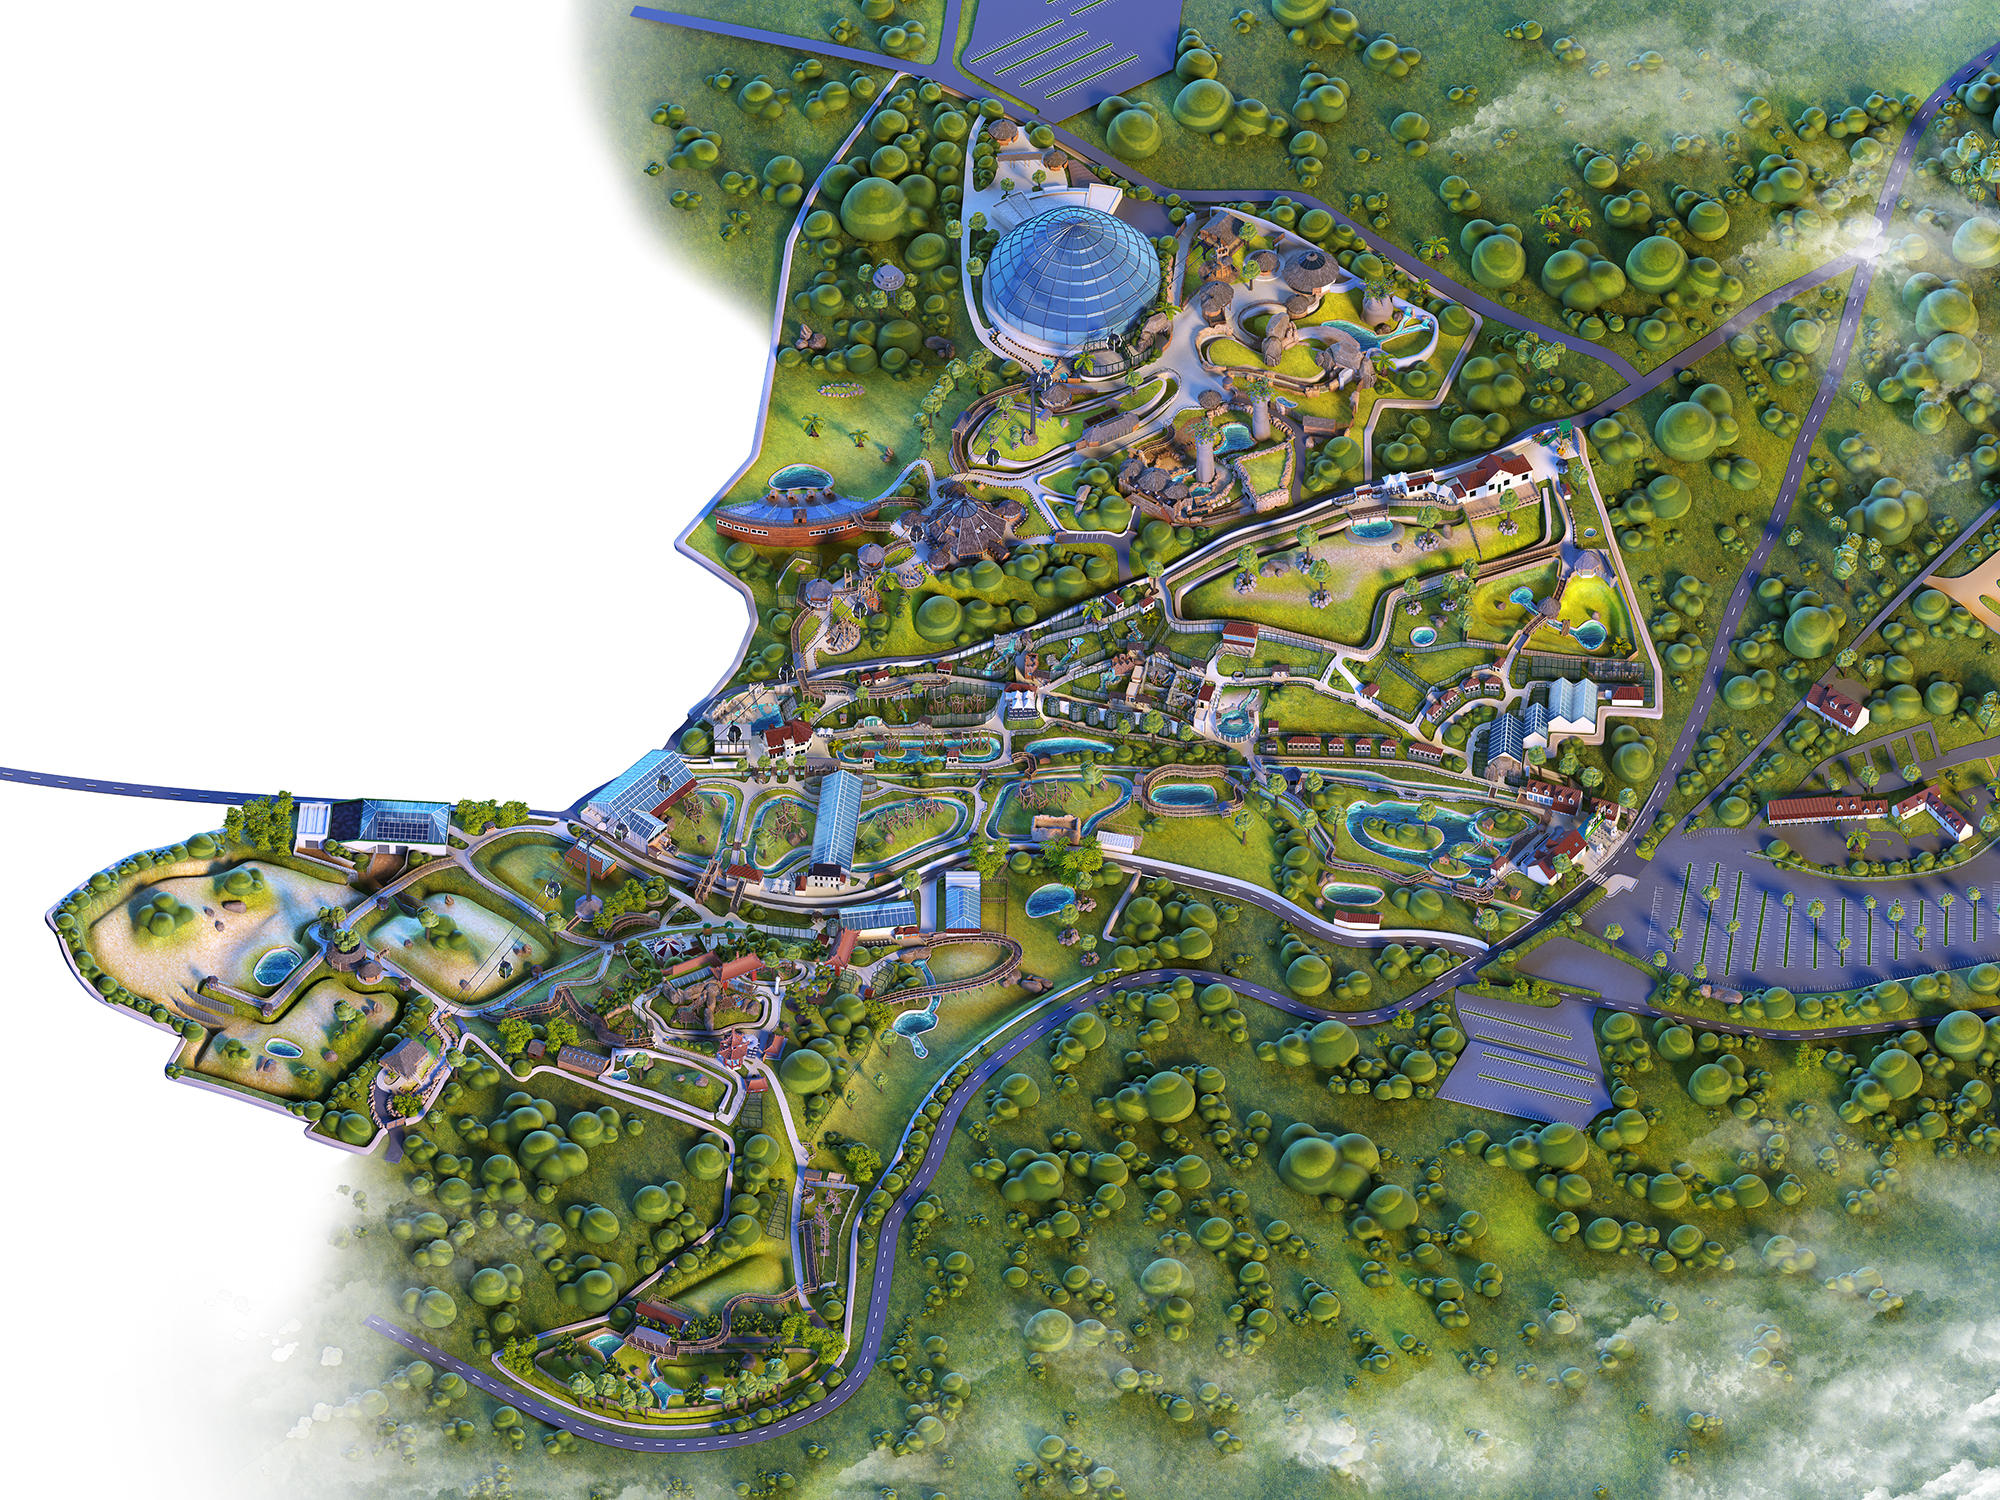 Modélisation 3D Zooparc Beauval